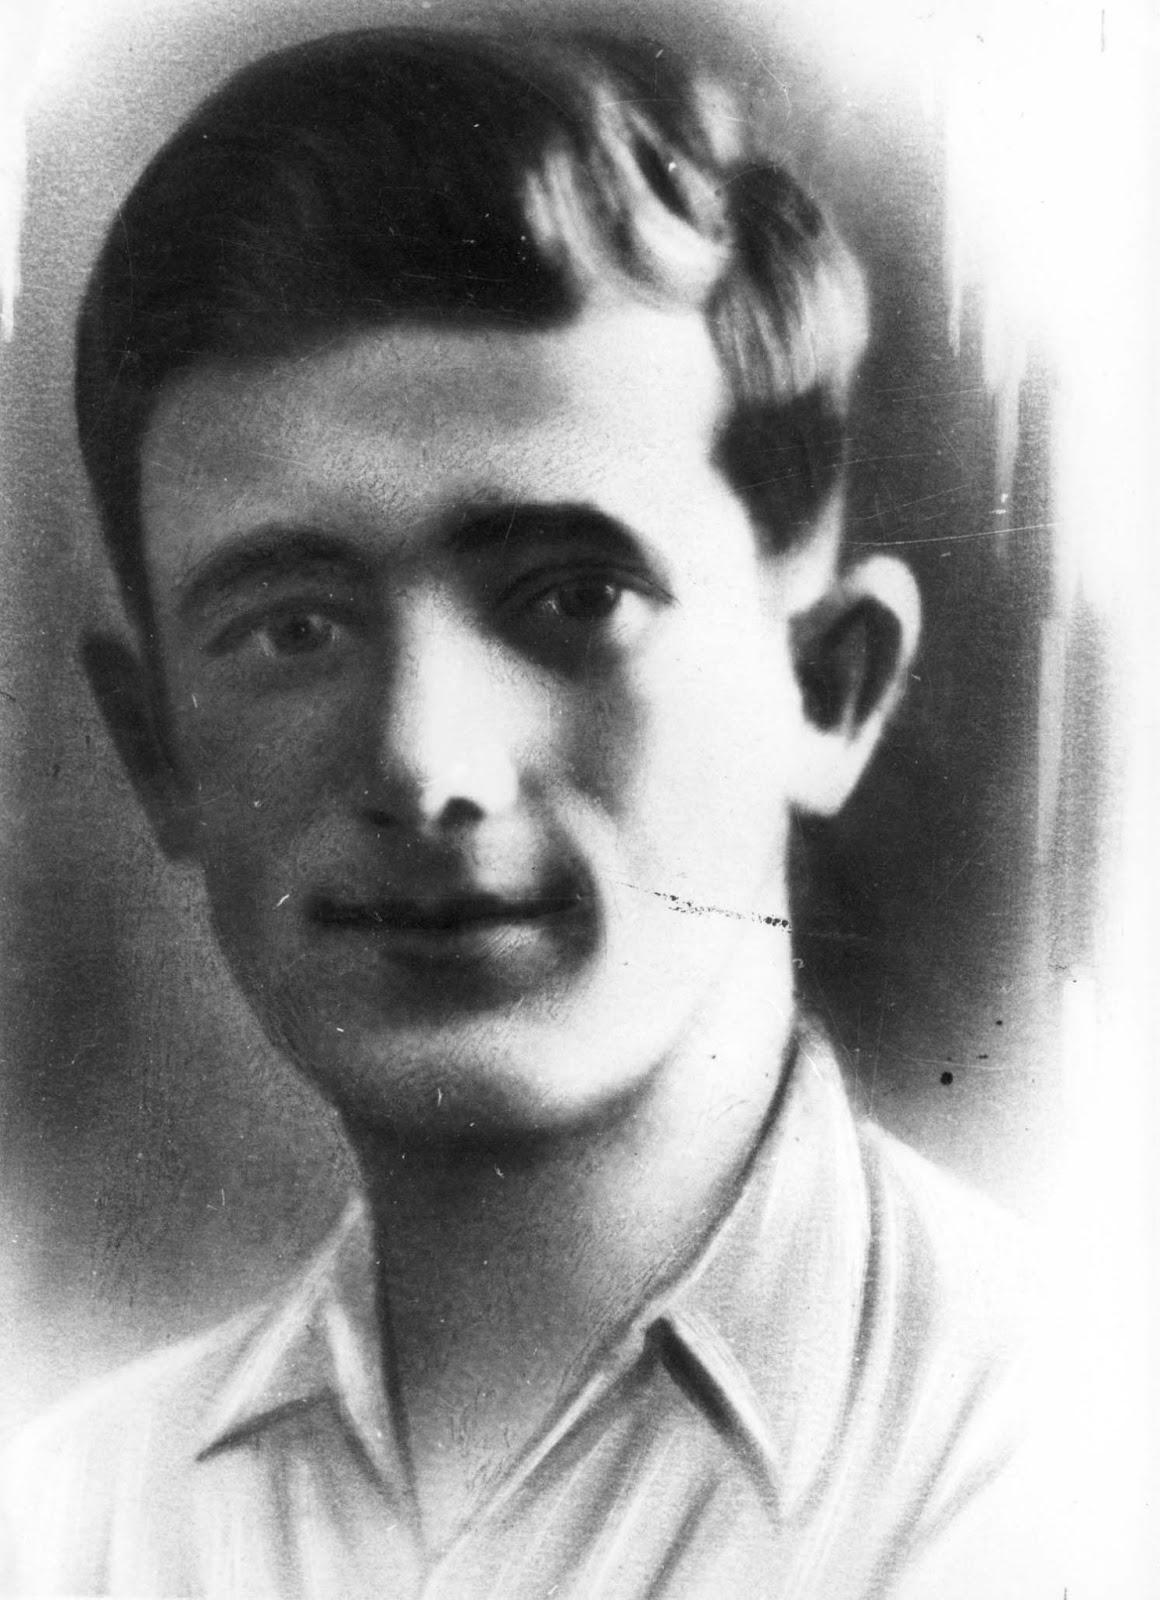 Mordechai Anielewicz.